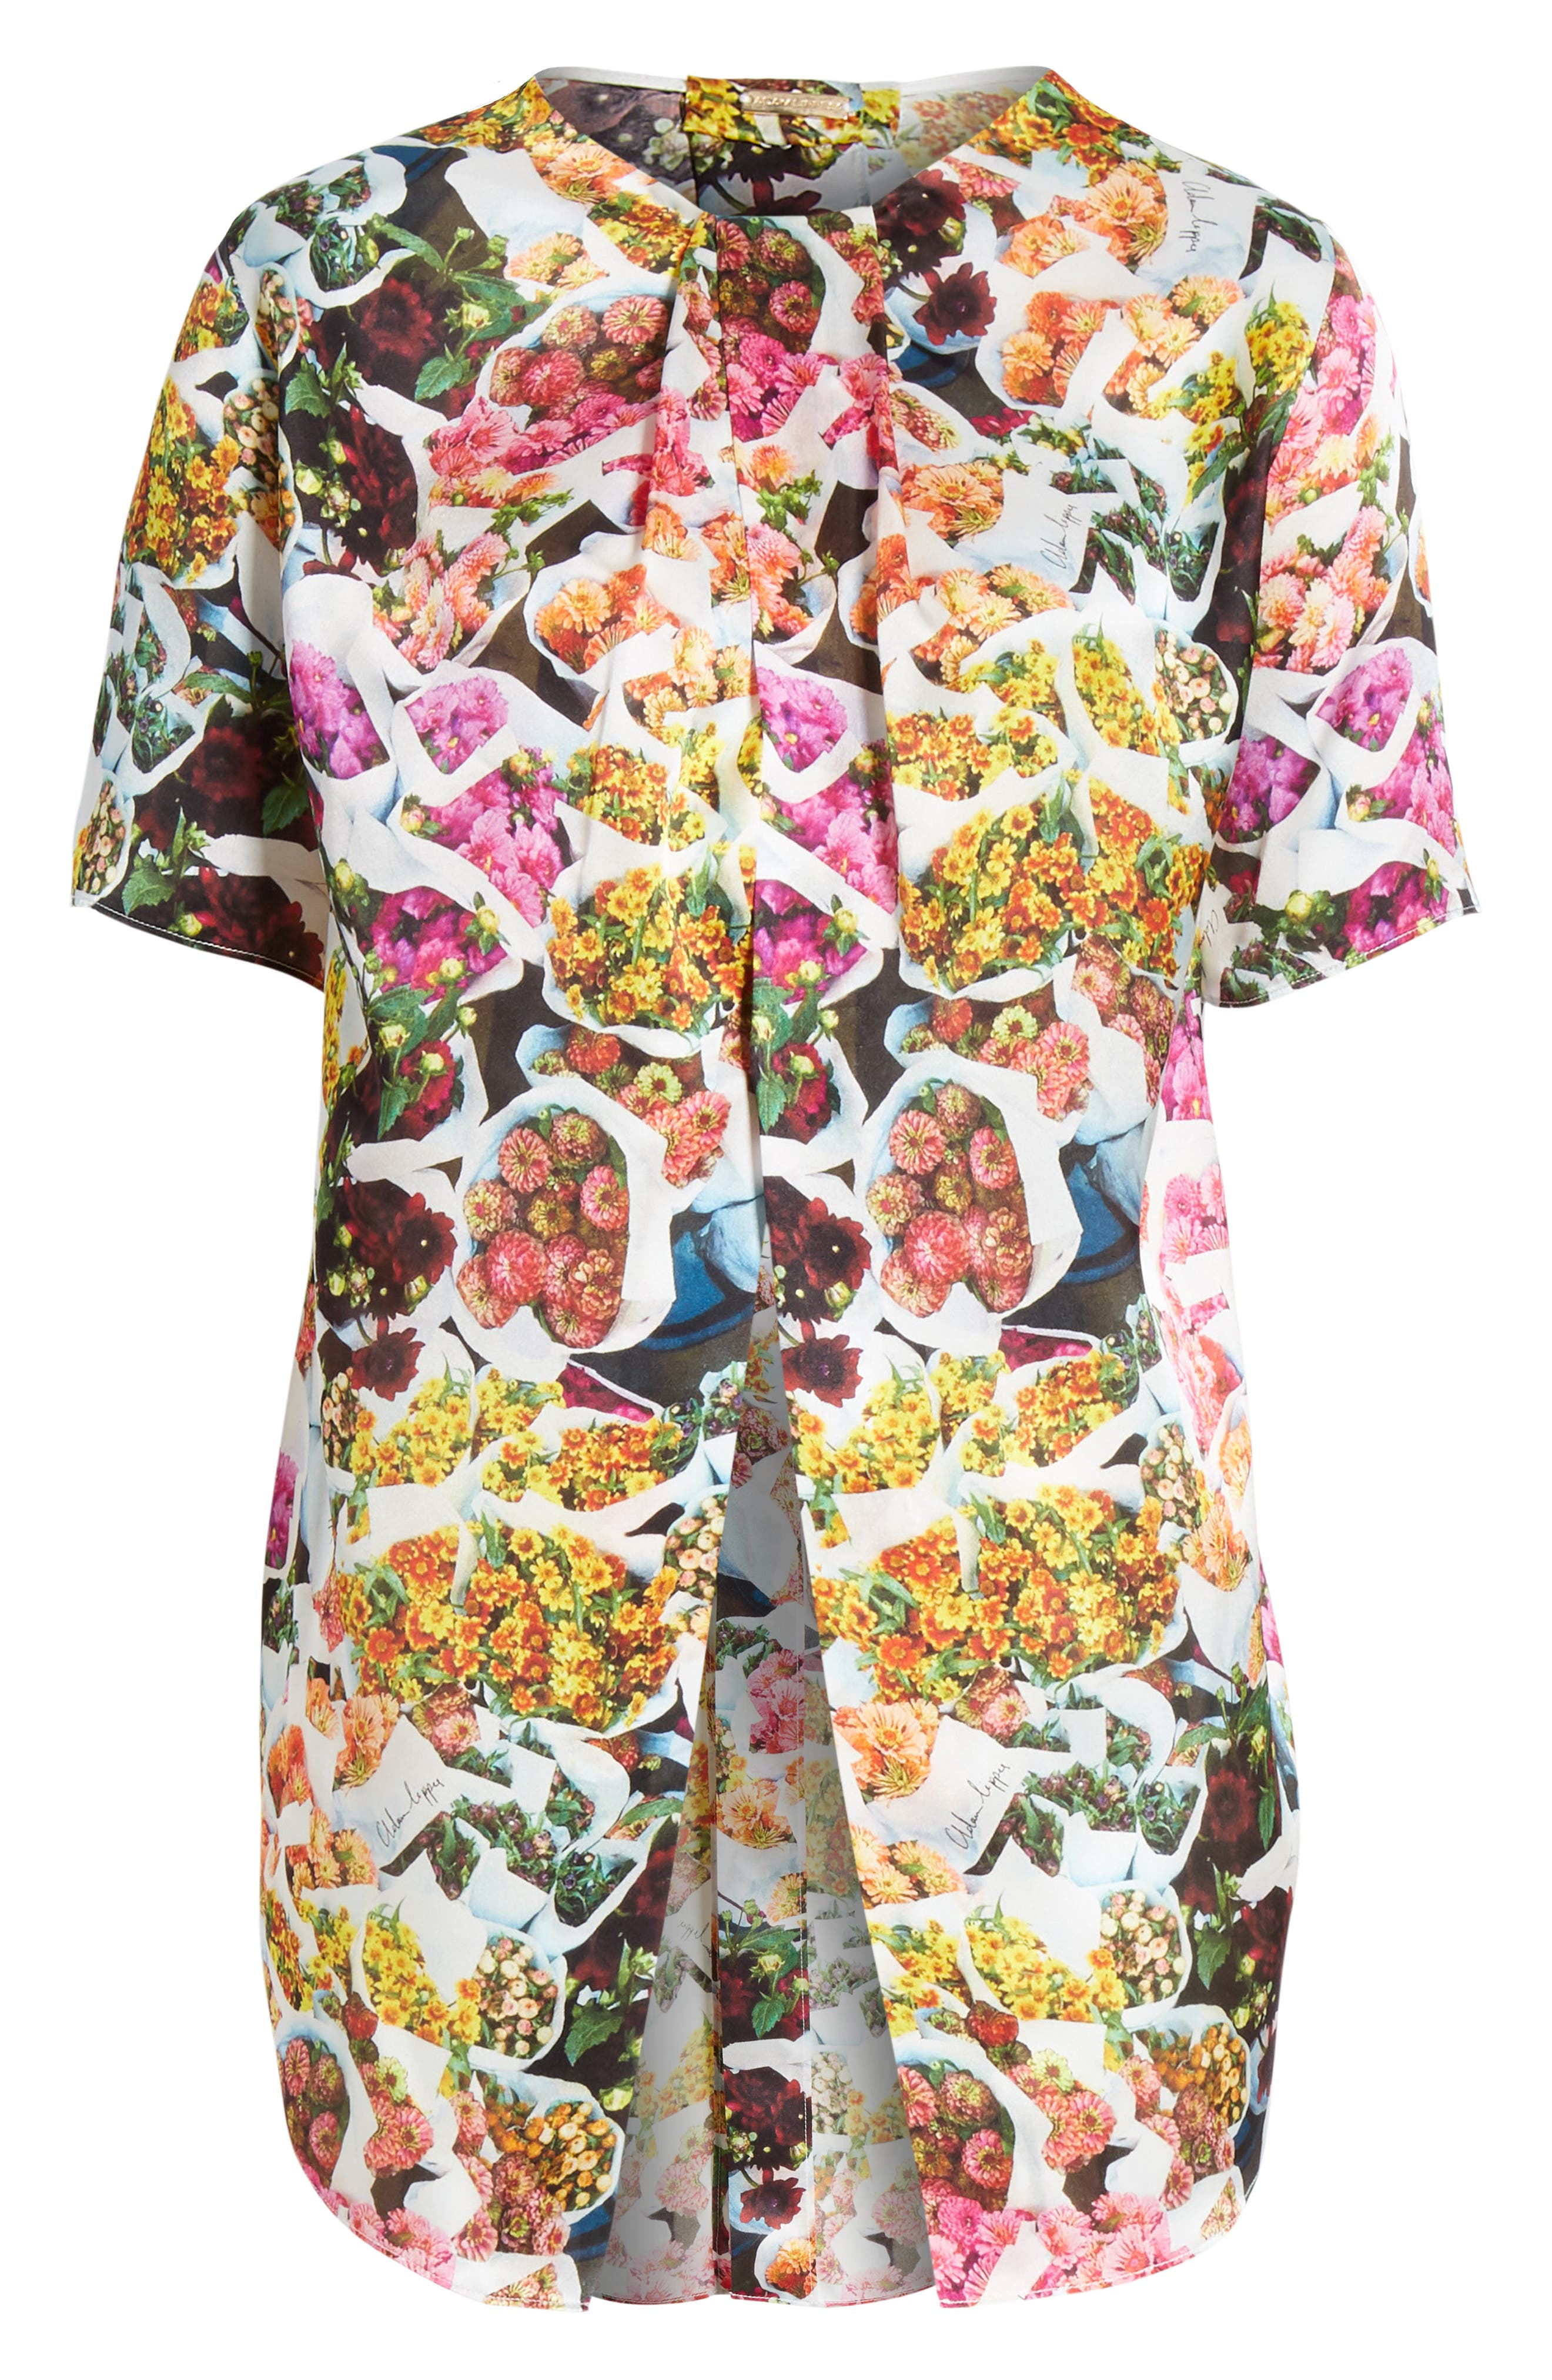 ADAM LIPPES,                             Floral Print Satin Top,                             Alternate thumbnail 6, color,                             FLORAL MULTI